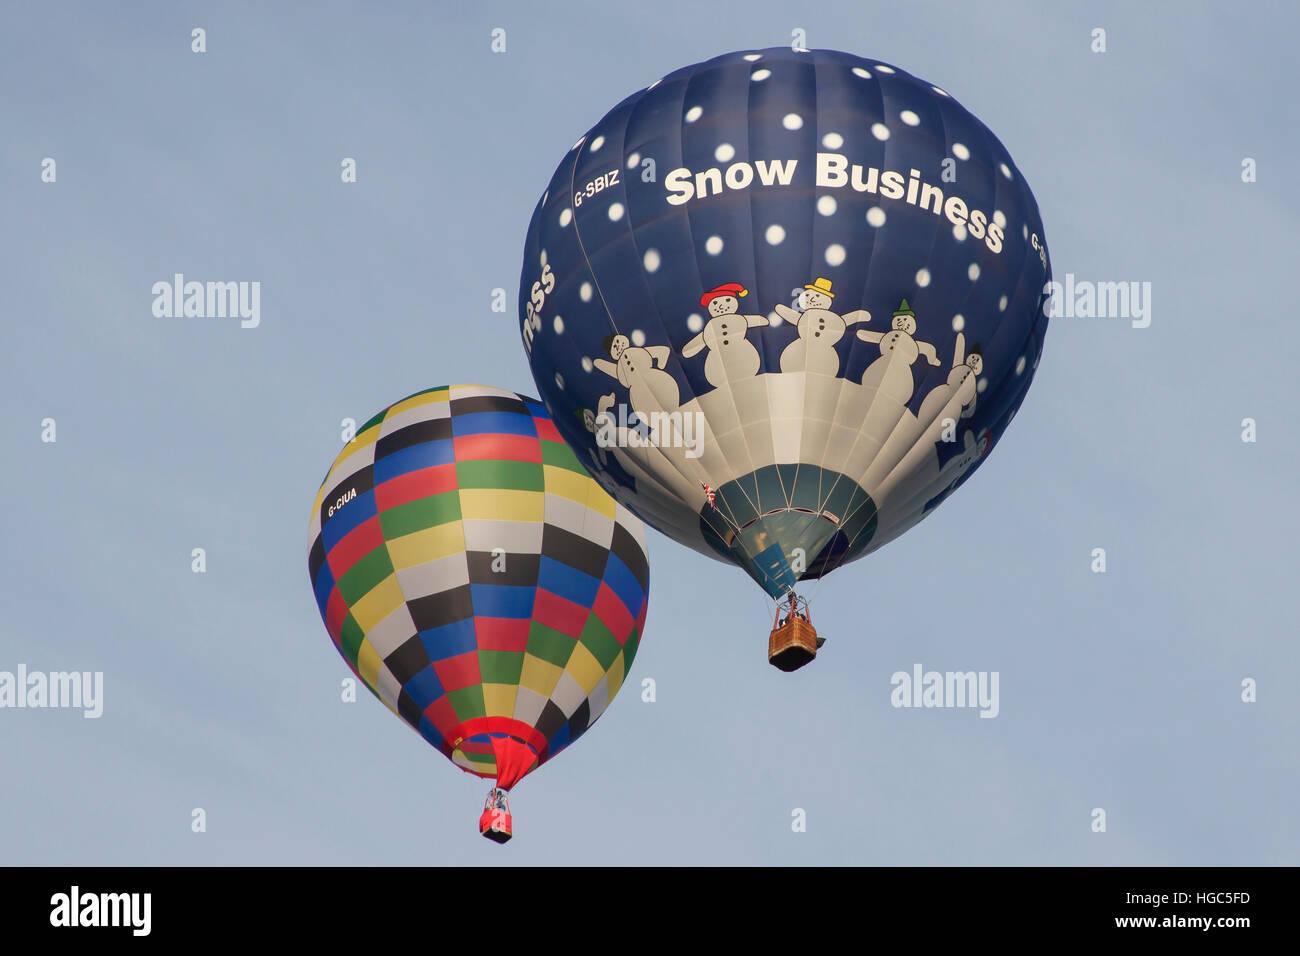 G-SBIZ Cameron en globo de aire caliente de nieve Business en la Bristol International Balloon Fiesta 2016 Foto de stock